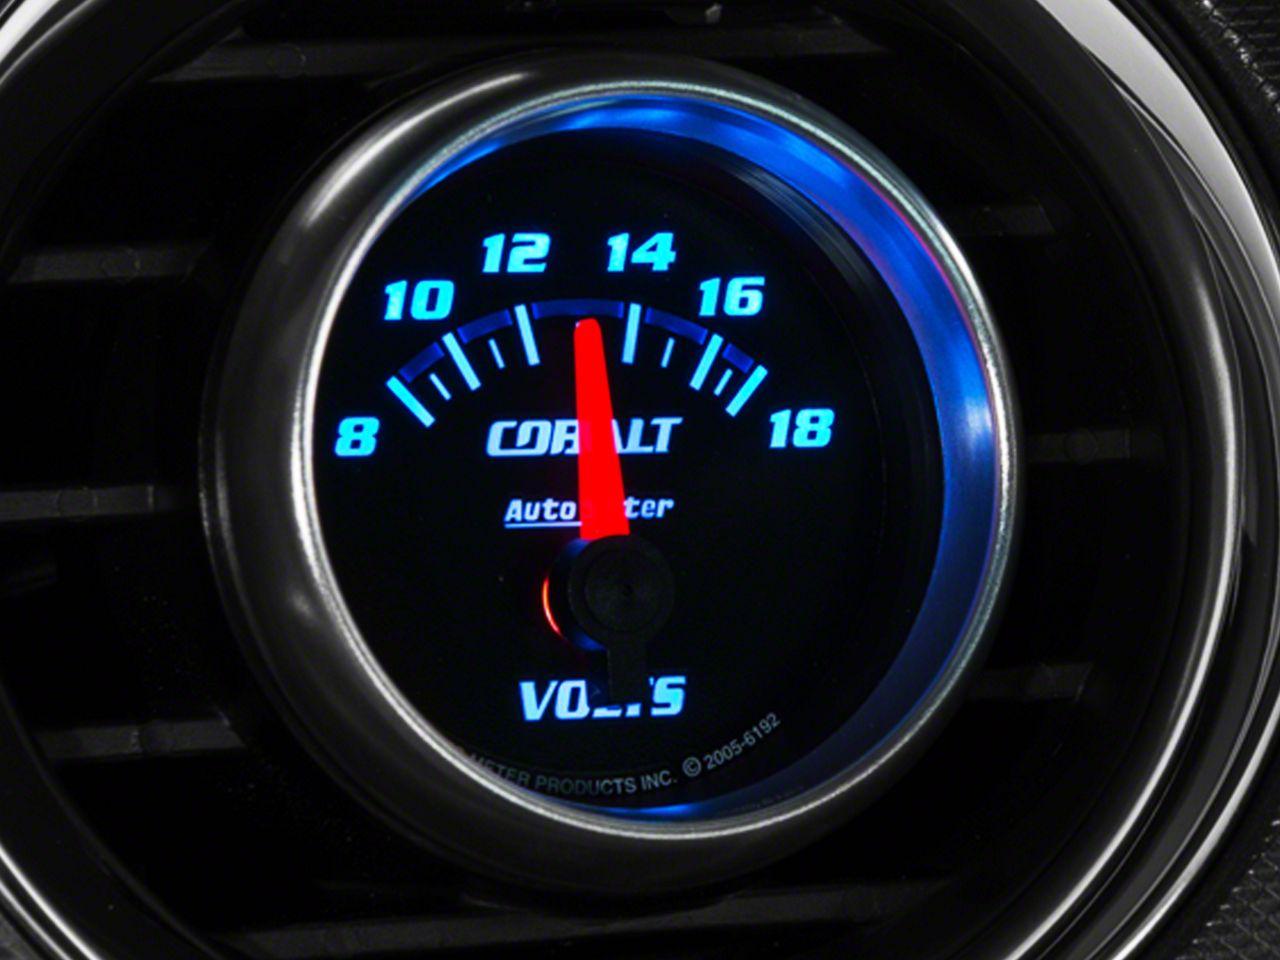 Auto Meter Cobalt Voltmeter Gauge - Electrical (08-18 All)